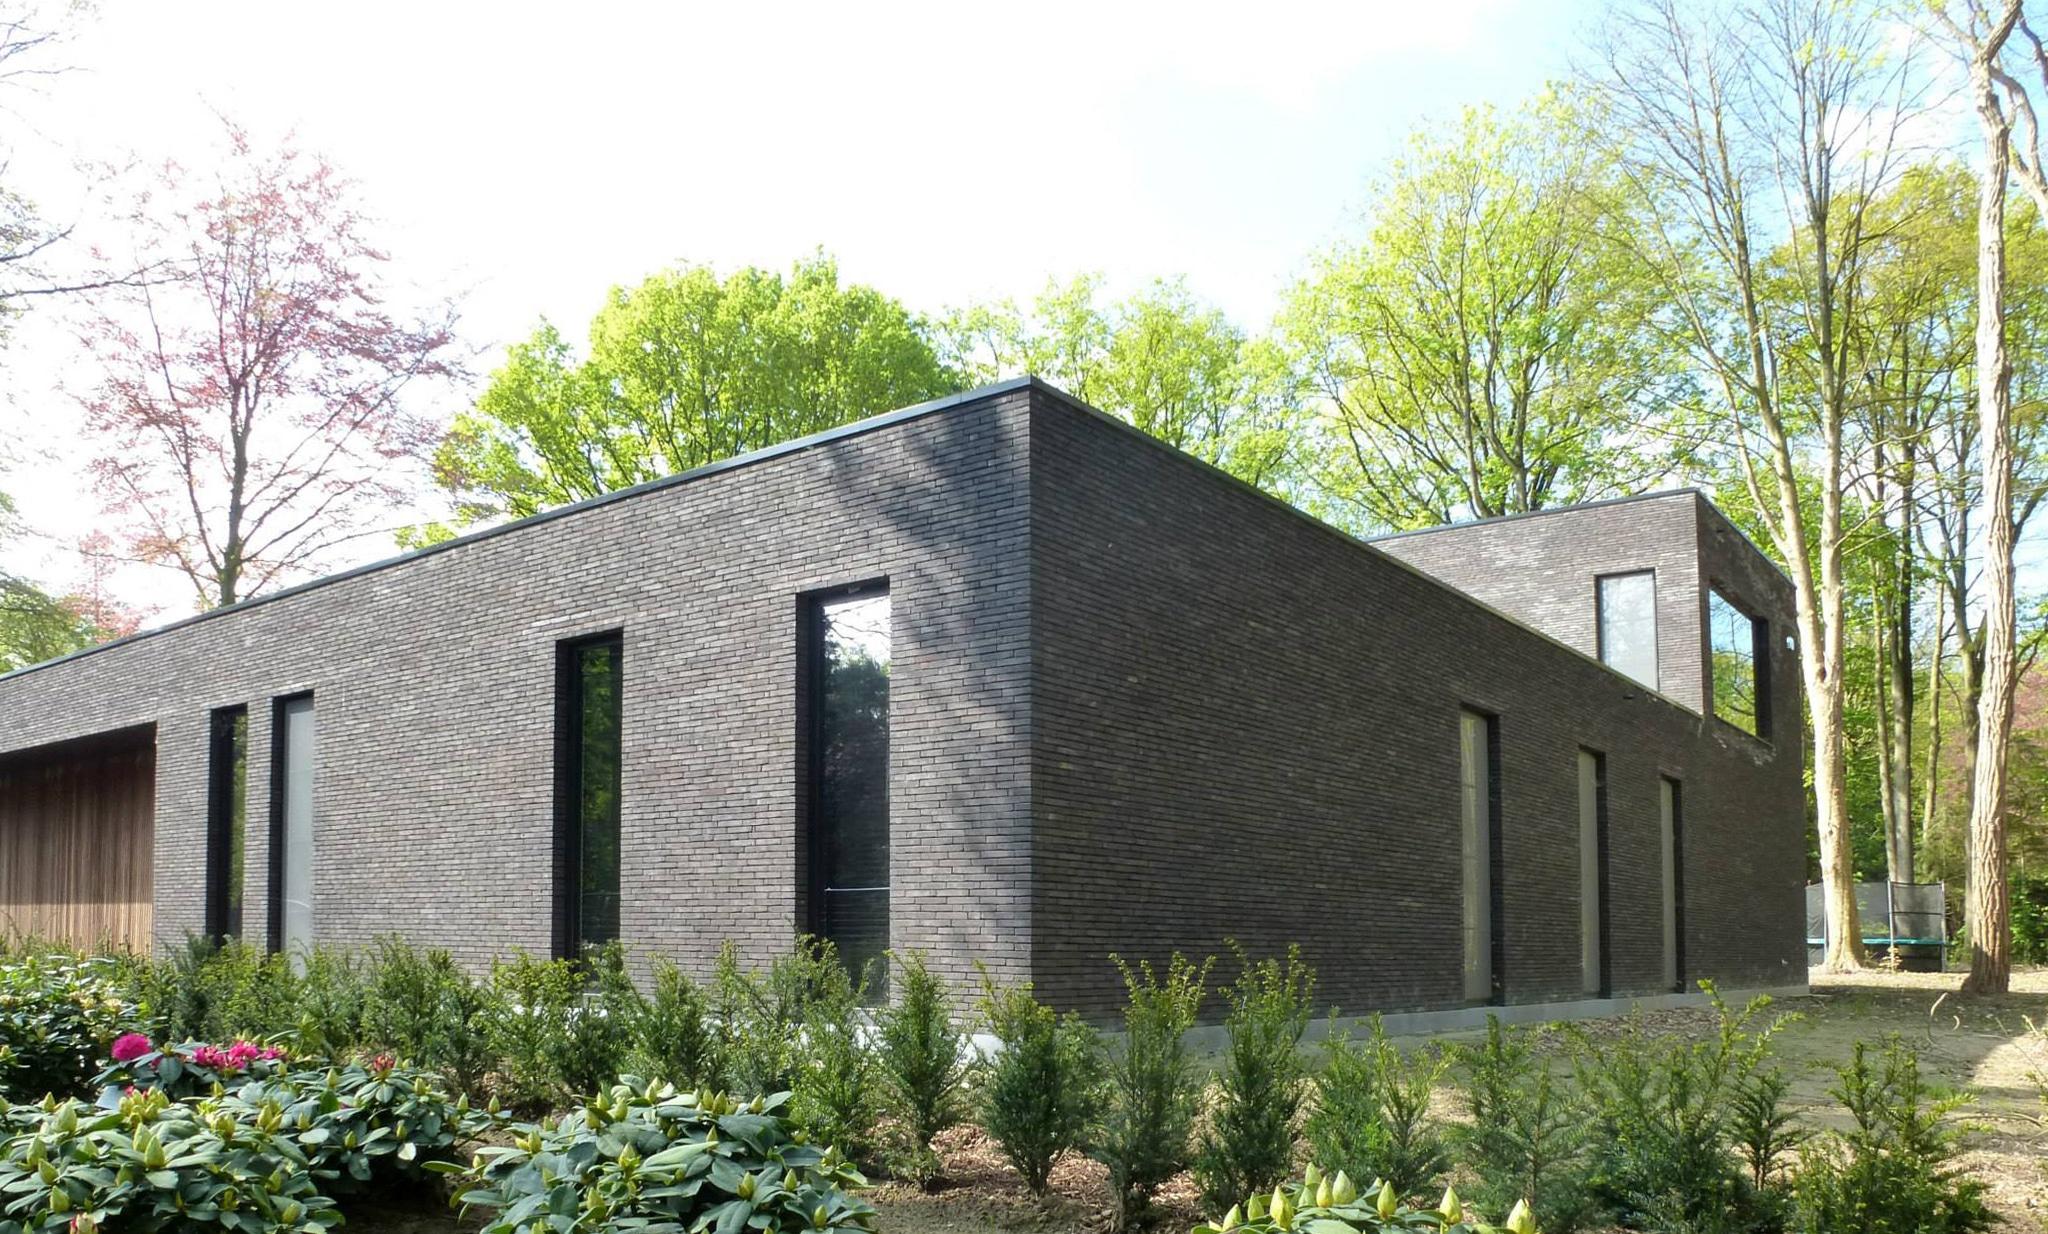 10257460 628031130608098 7661798295029162066 o | Baeyens & Beck architecten Gent | architect nieuwbouw renovatie interieur | high end | architectenbureau